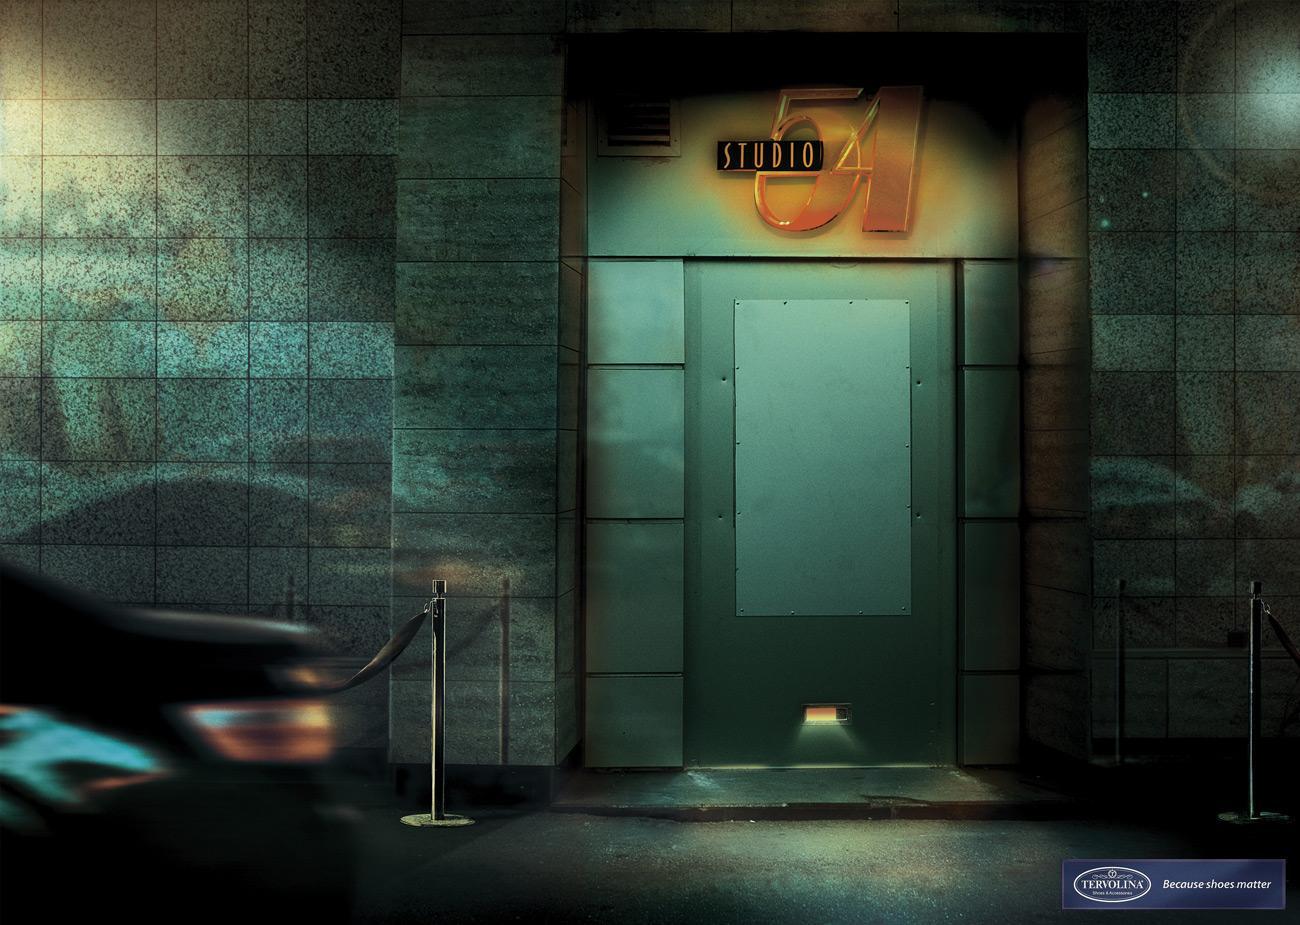 Tervolina Print Ad - Nightclub & Tervolina Print Advert By BBDO: Nightclub | Ads of the World™